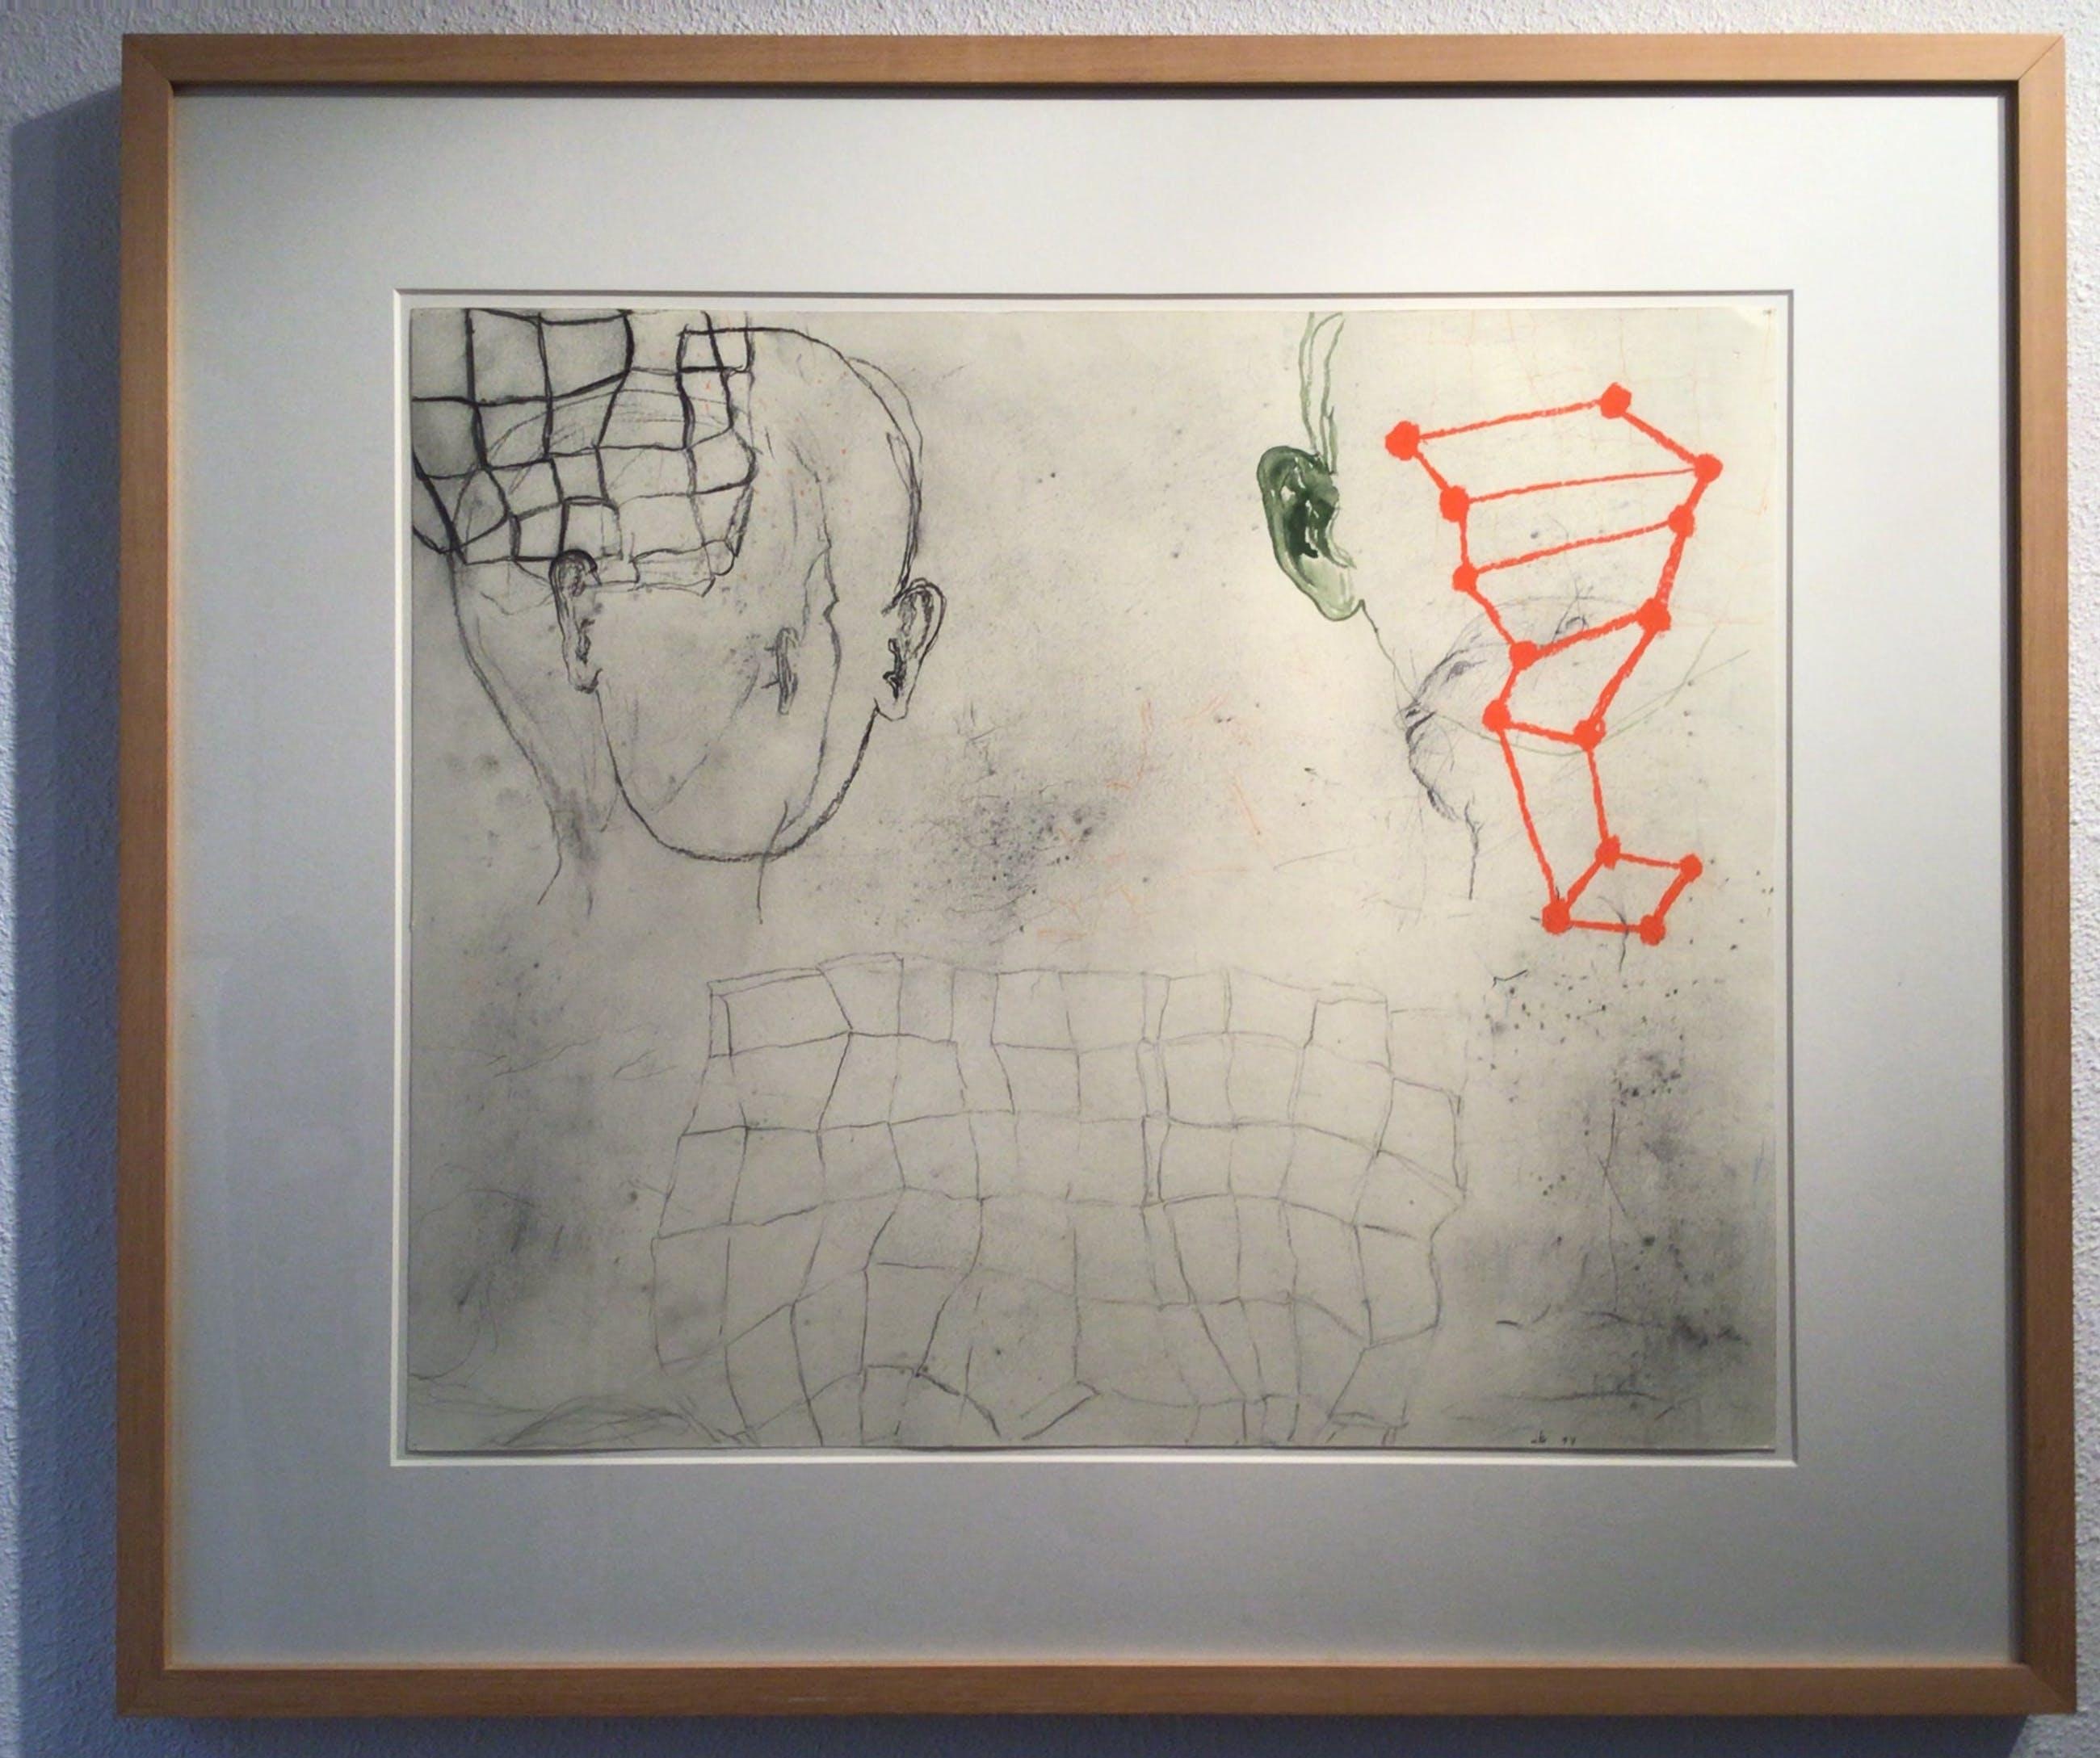 Arno Kramer - ZT - Originele tekening - potlood, krijt, aquarel - Ingelijst kopen? Bied vanaf 450!